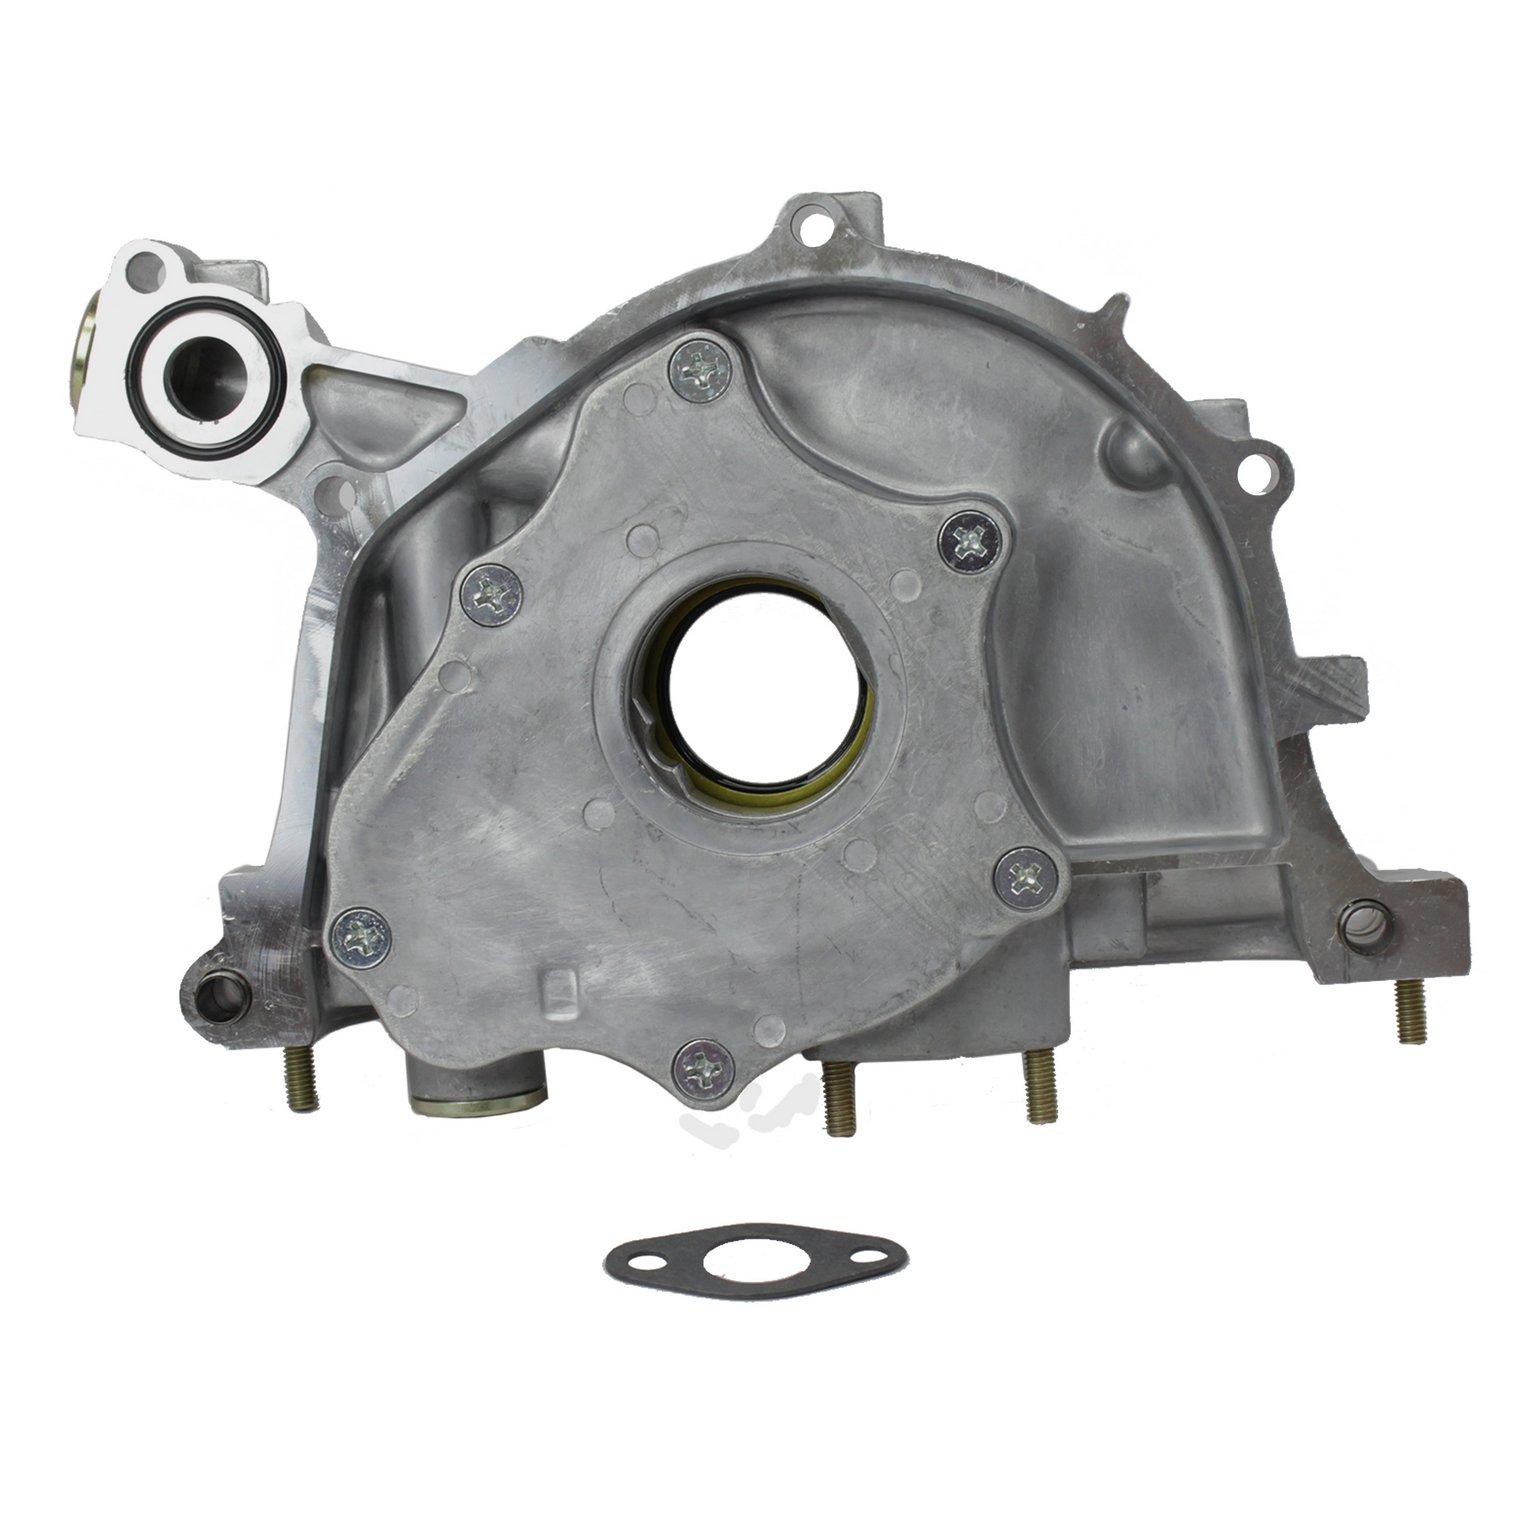 Acura Integra Engine Oil Pump AutoPartsKartcom - 1990 acura integra motor